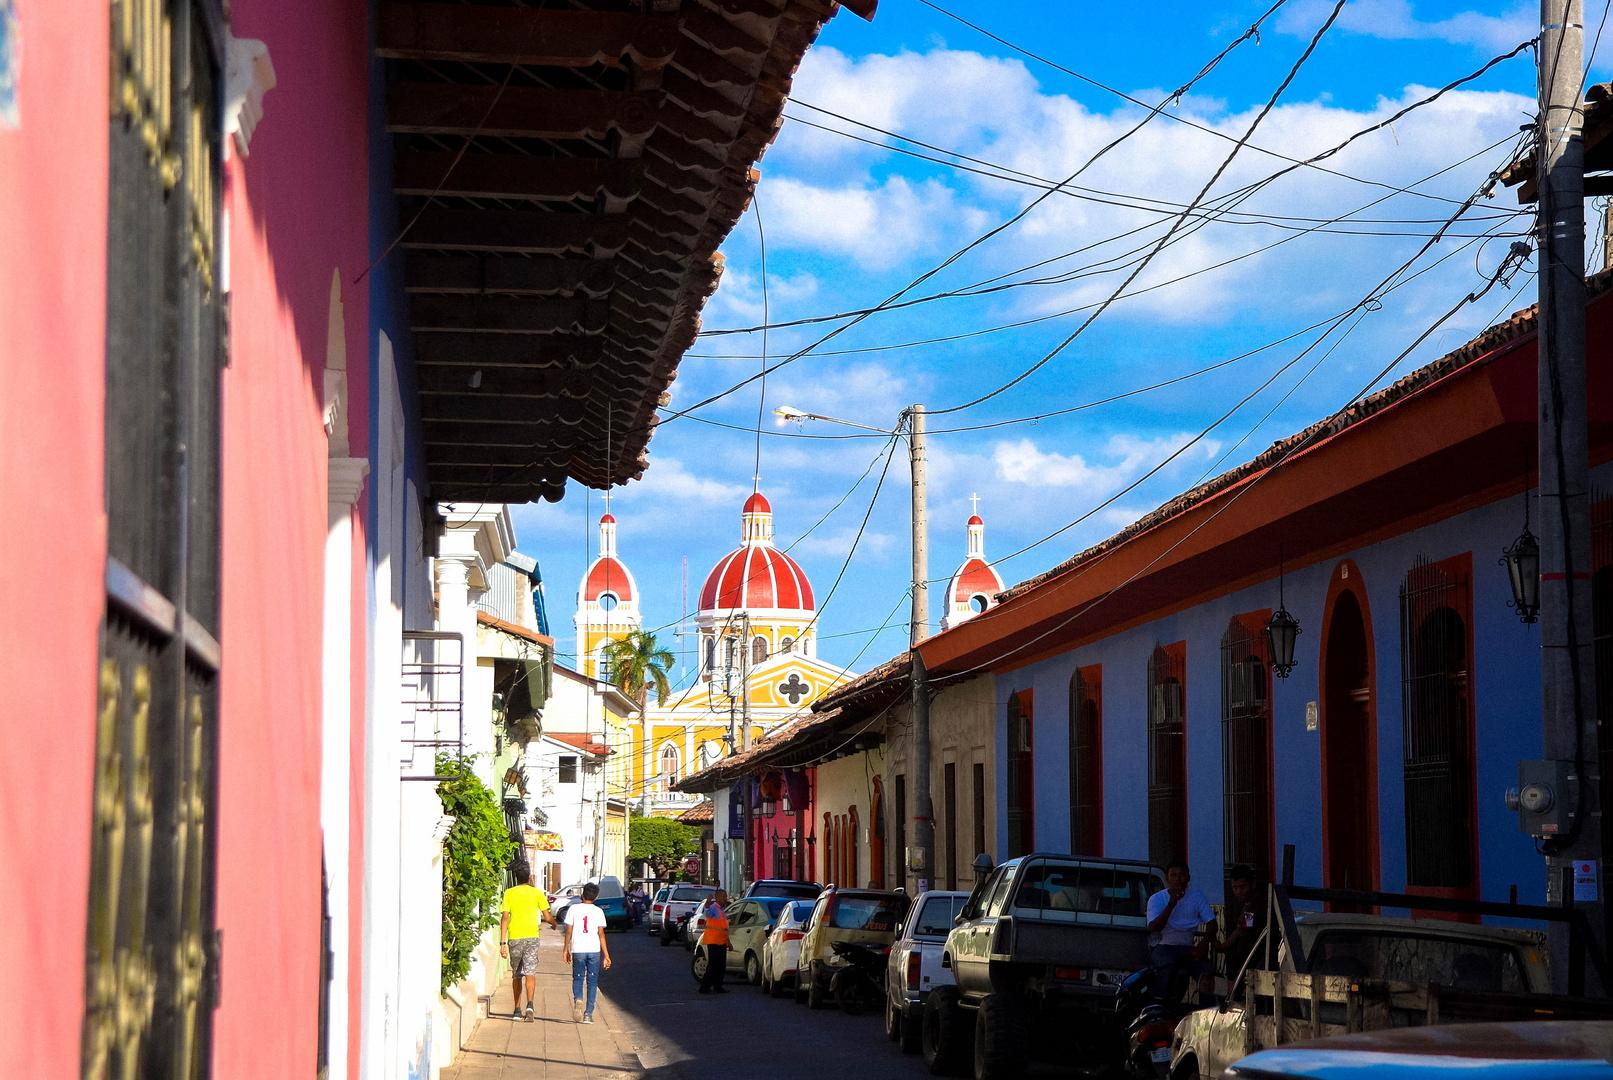 Streets of Granada.